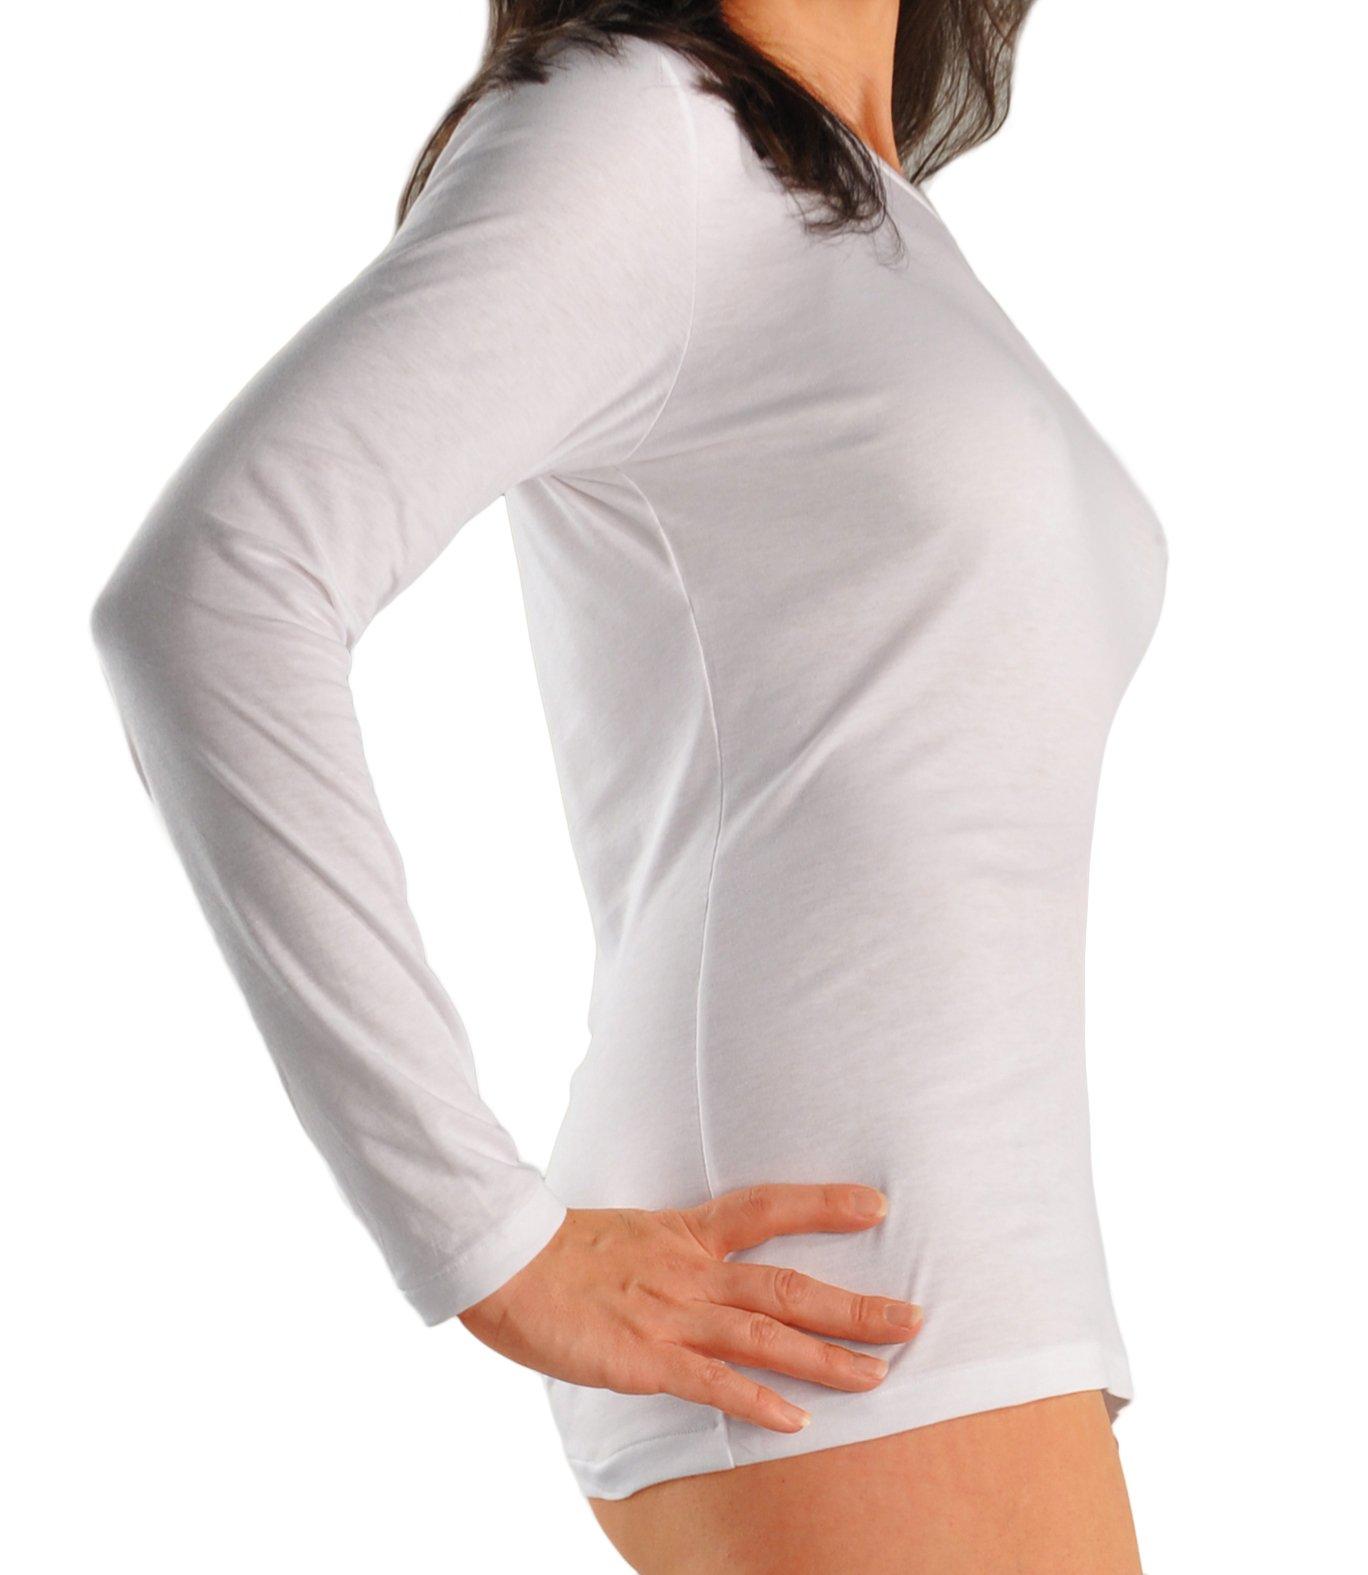 Zimmerli Certified Sea Island Crewneck Long Sleeve T-shirt XLarge/White